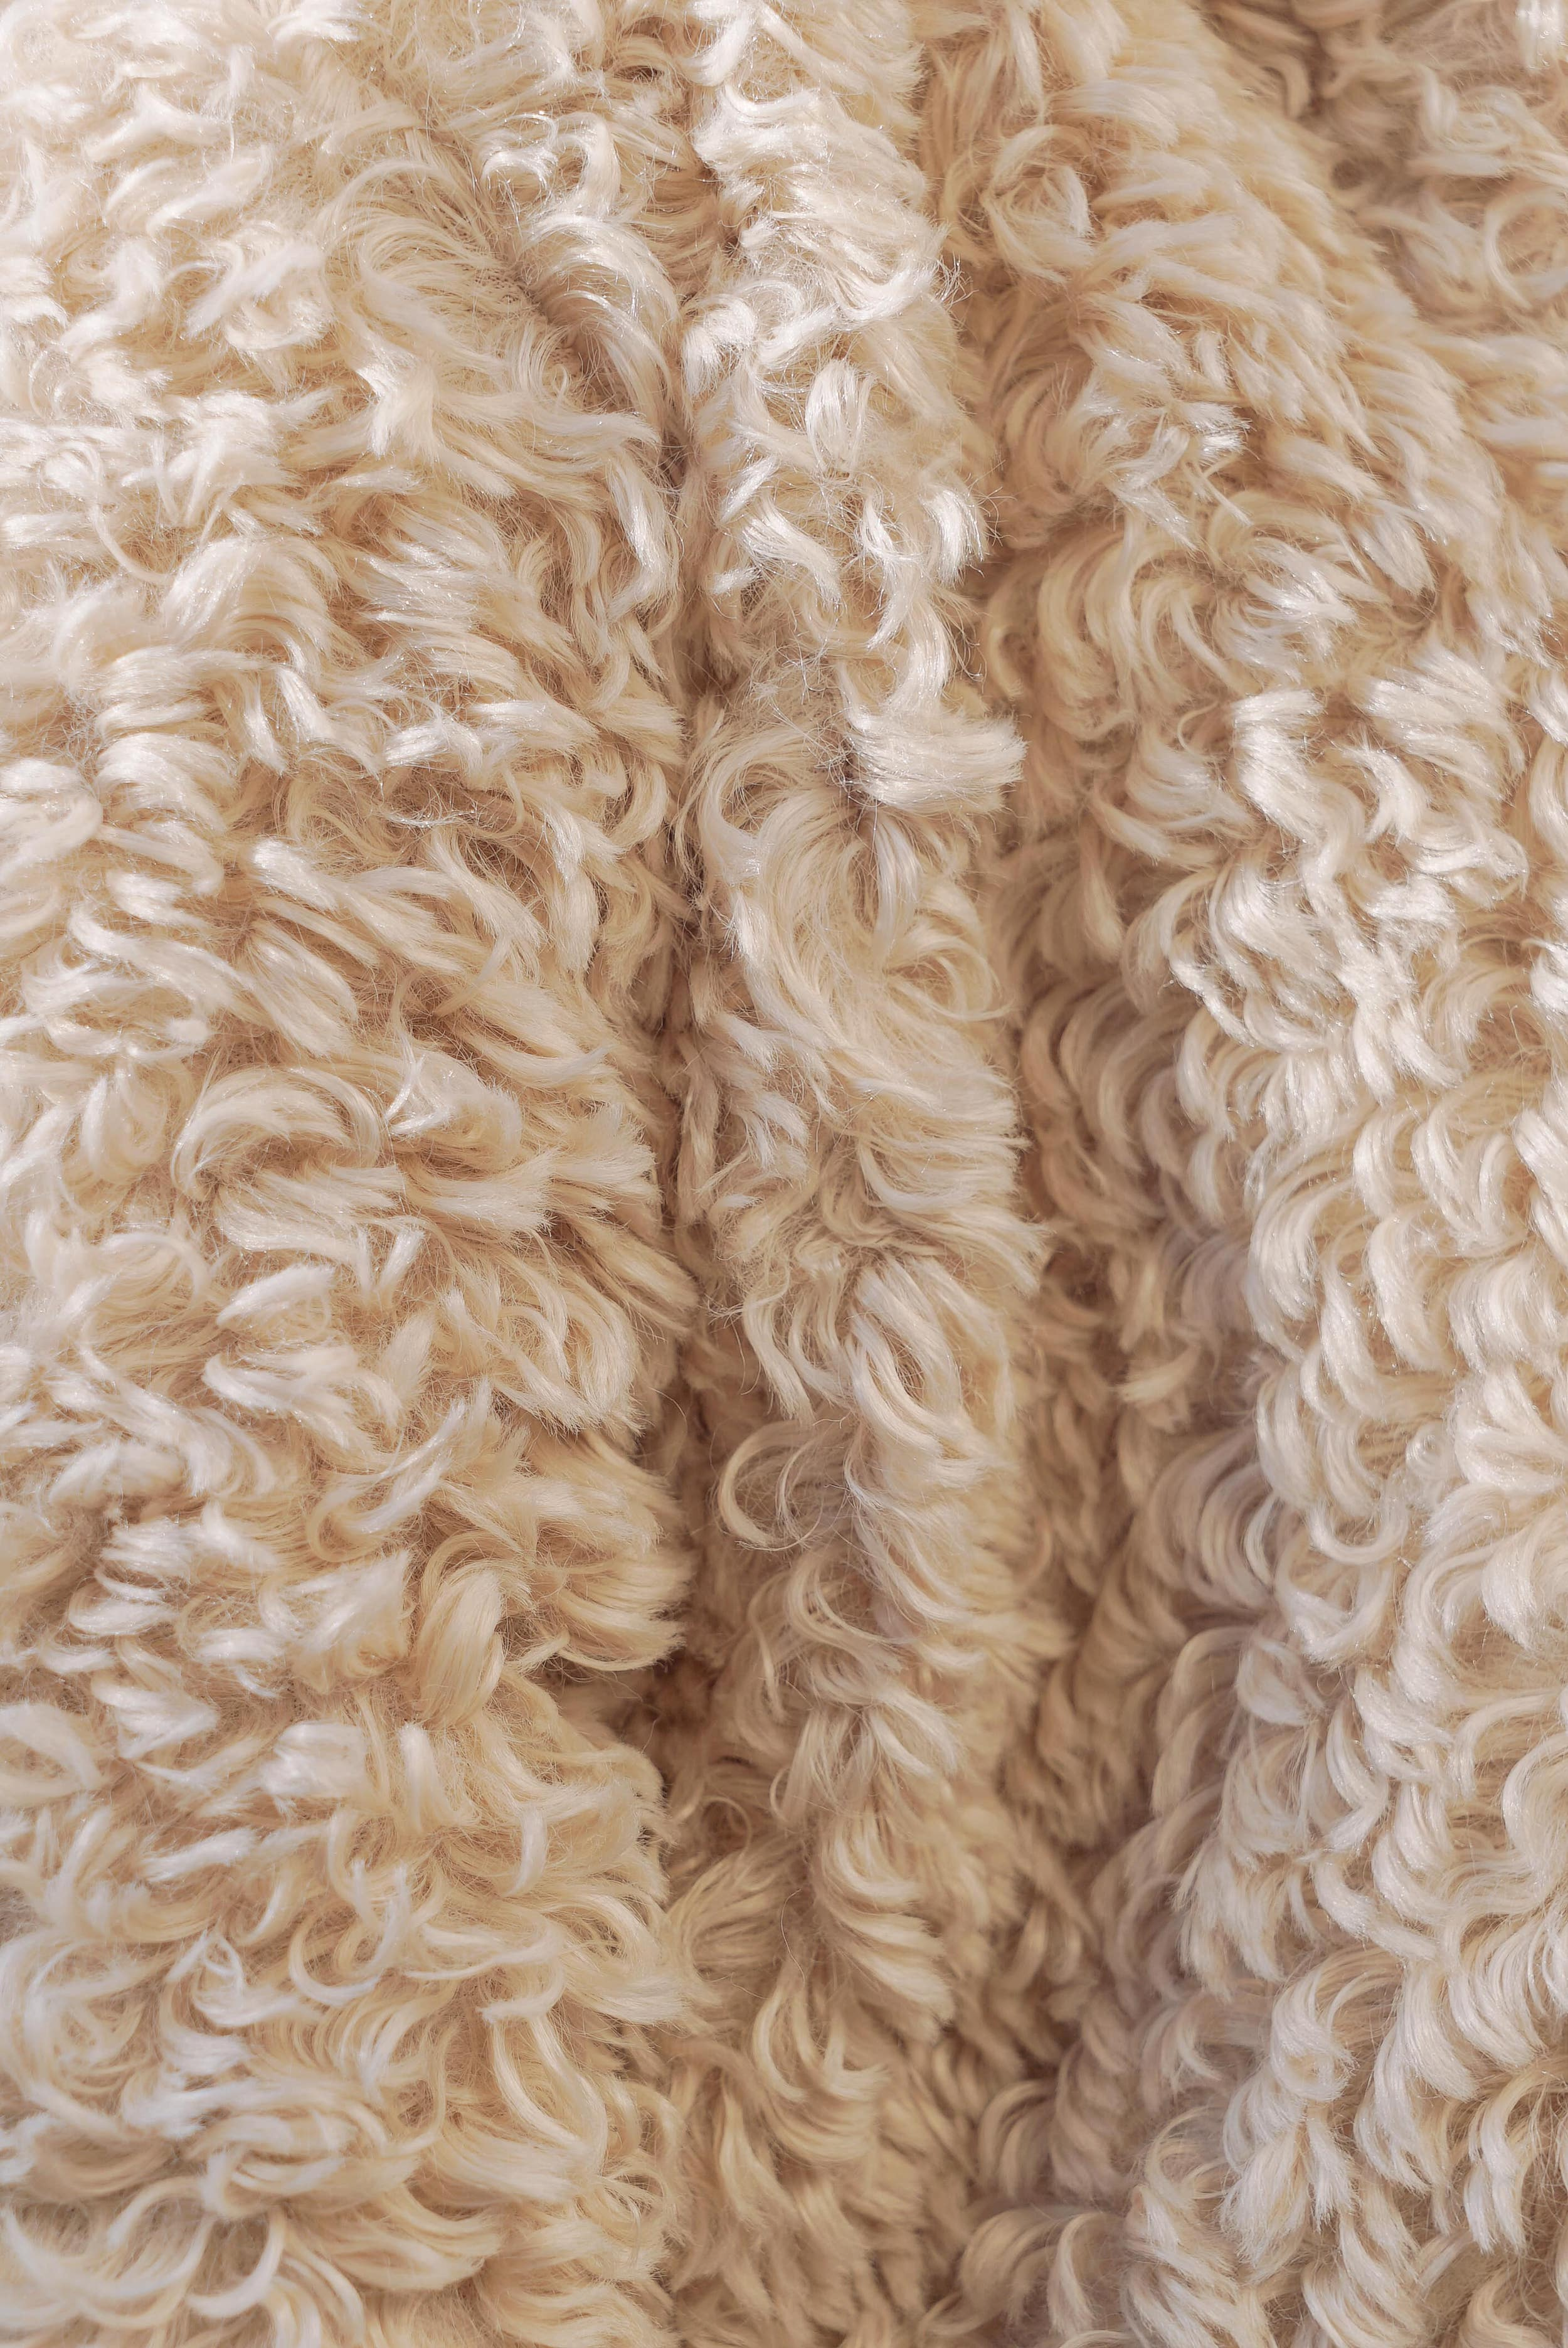 fausse-fourrure-style-mouton